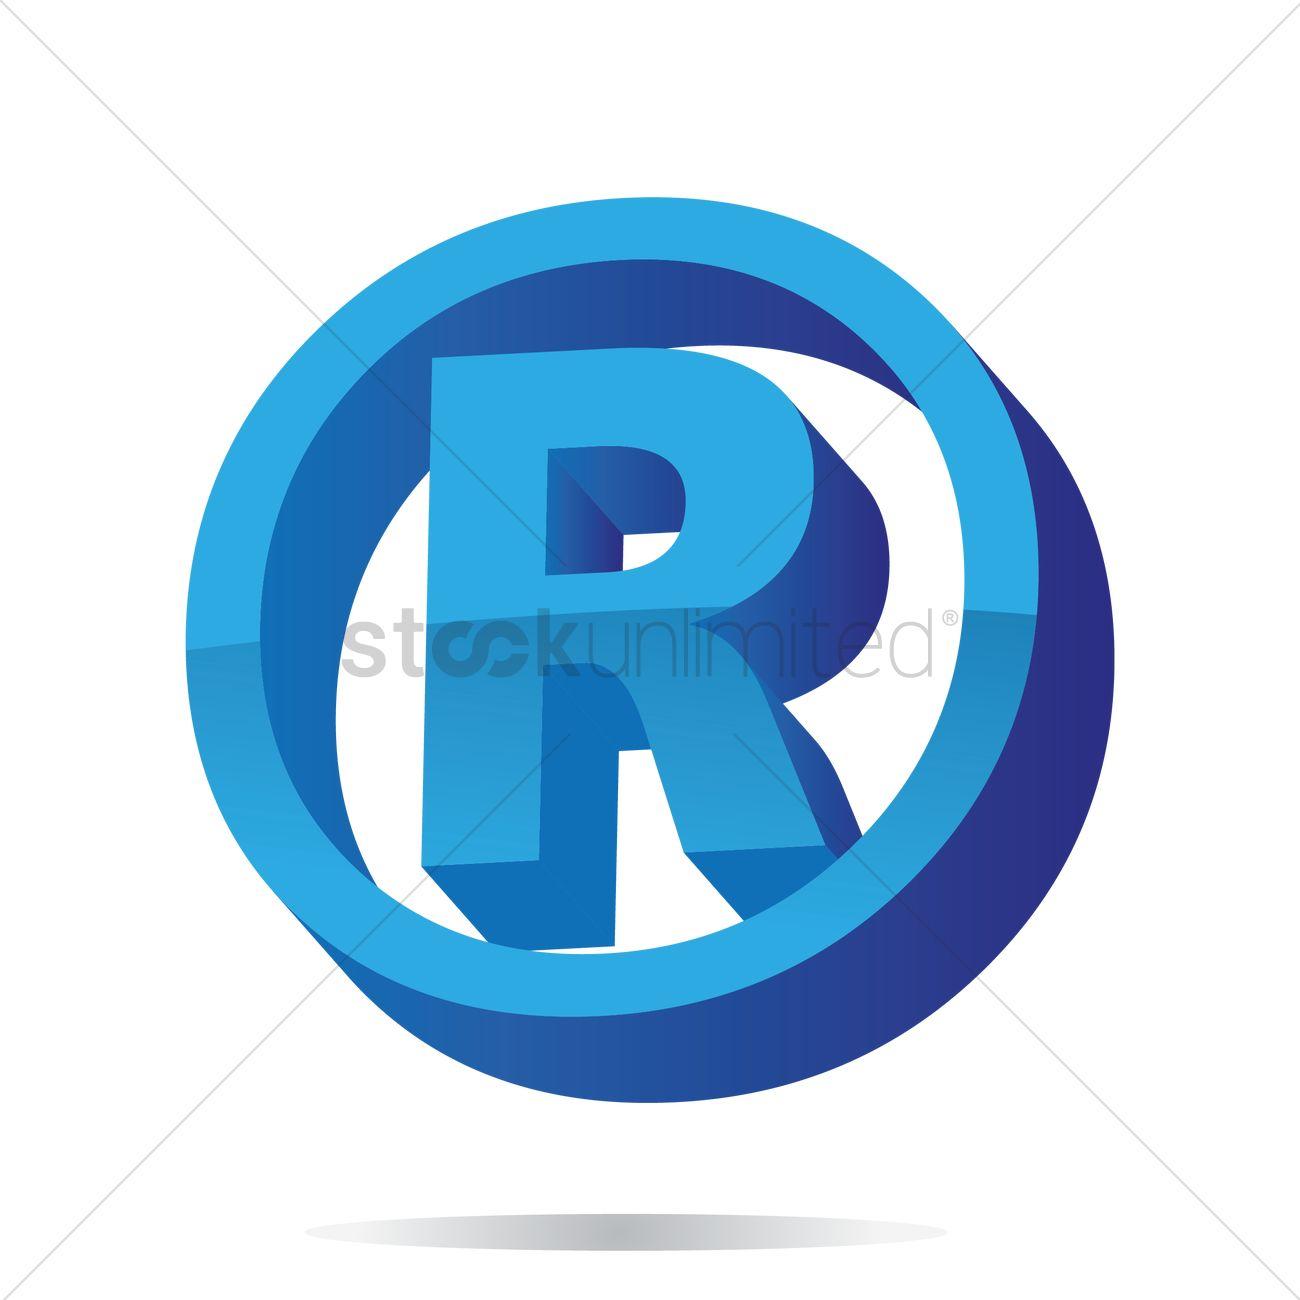 Registered Trademark Symbol Vector Image 1632168 Stockunlimited